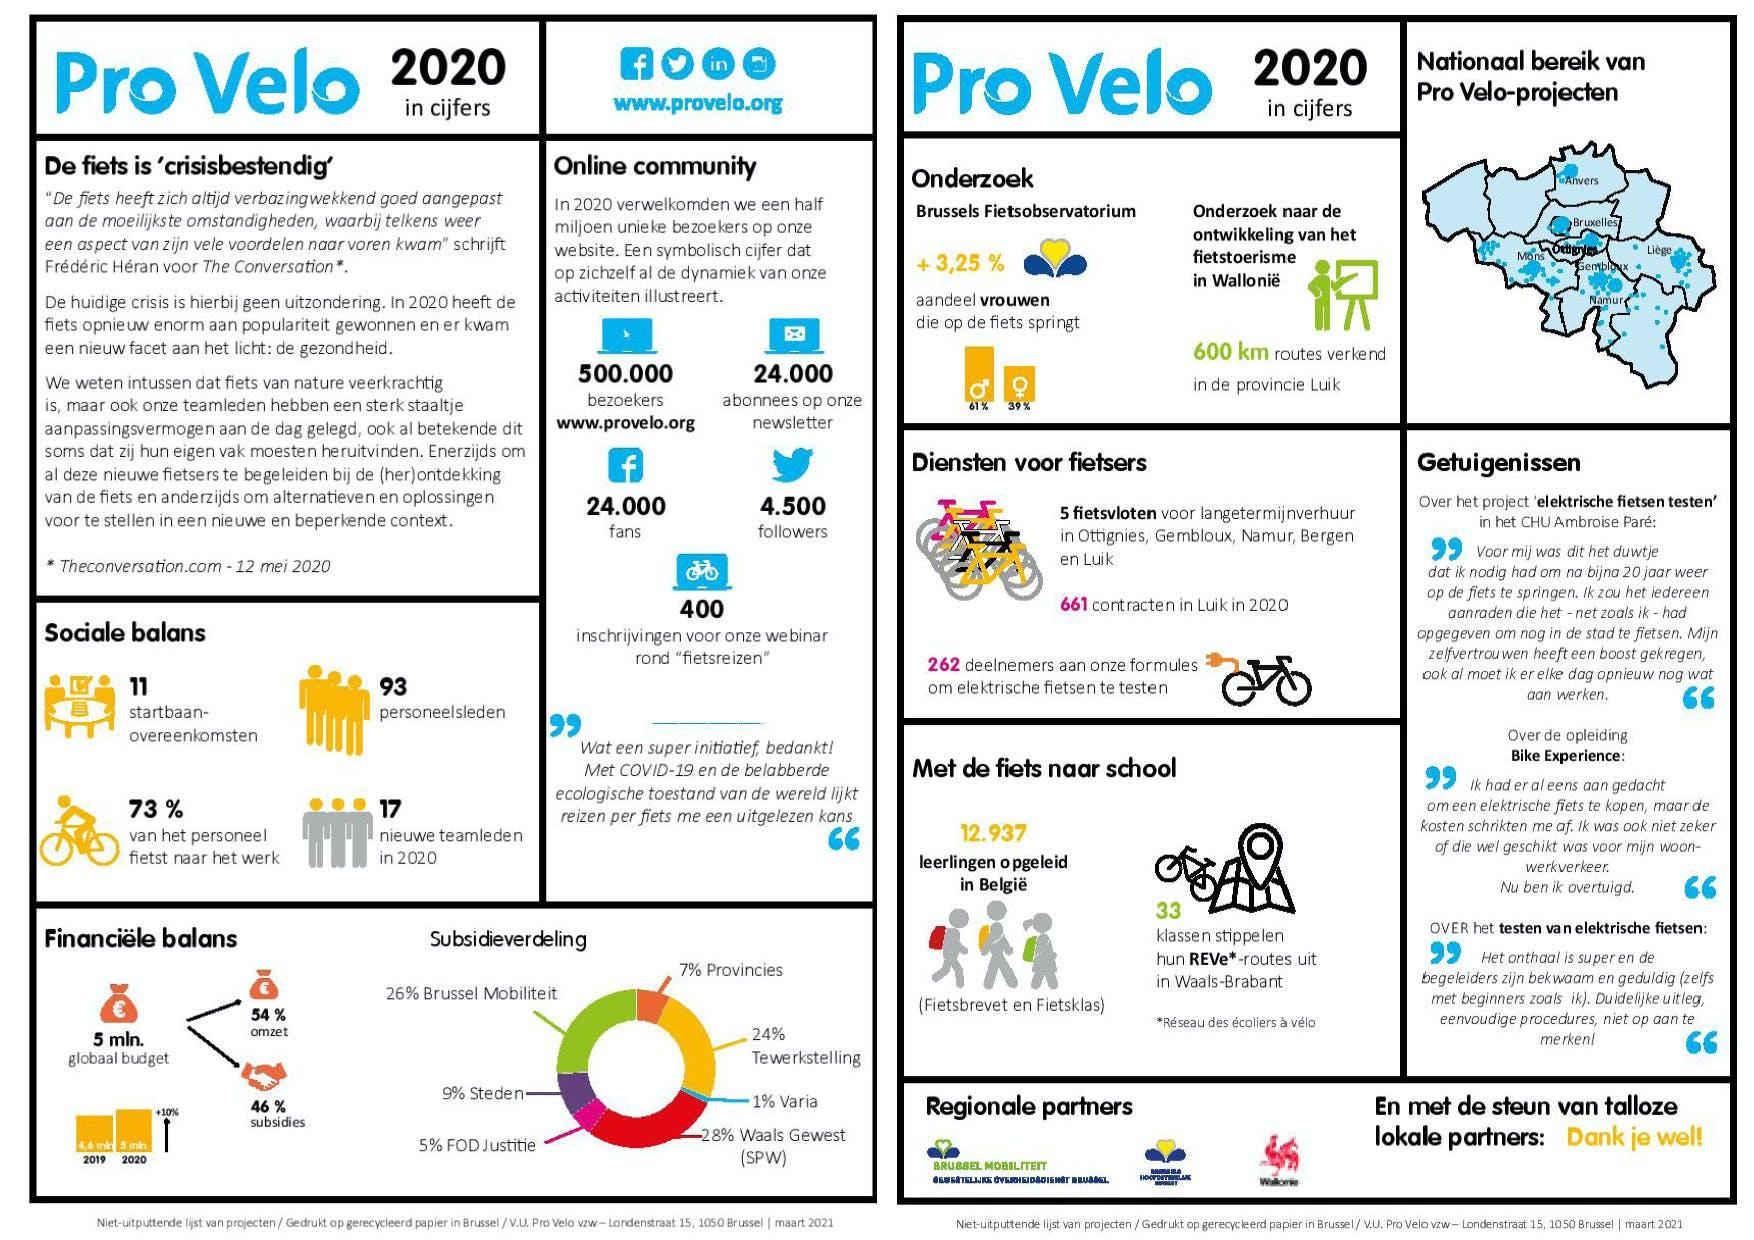 Pro Velo 2020: de cijfers